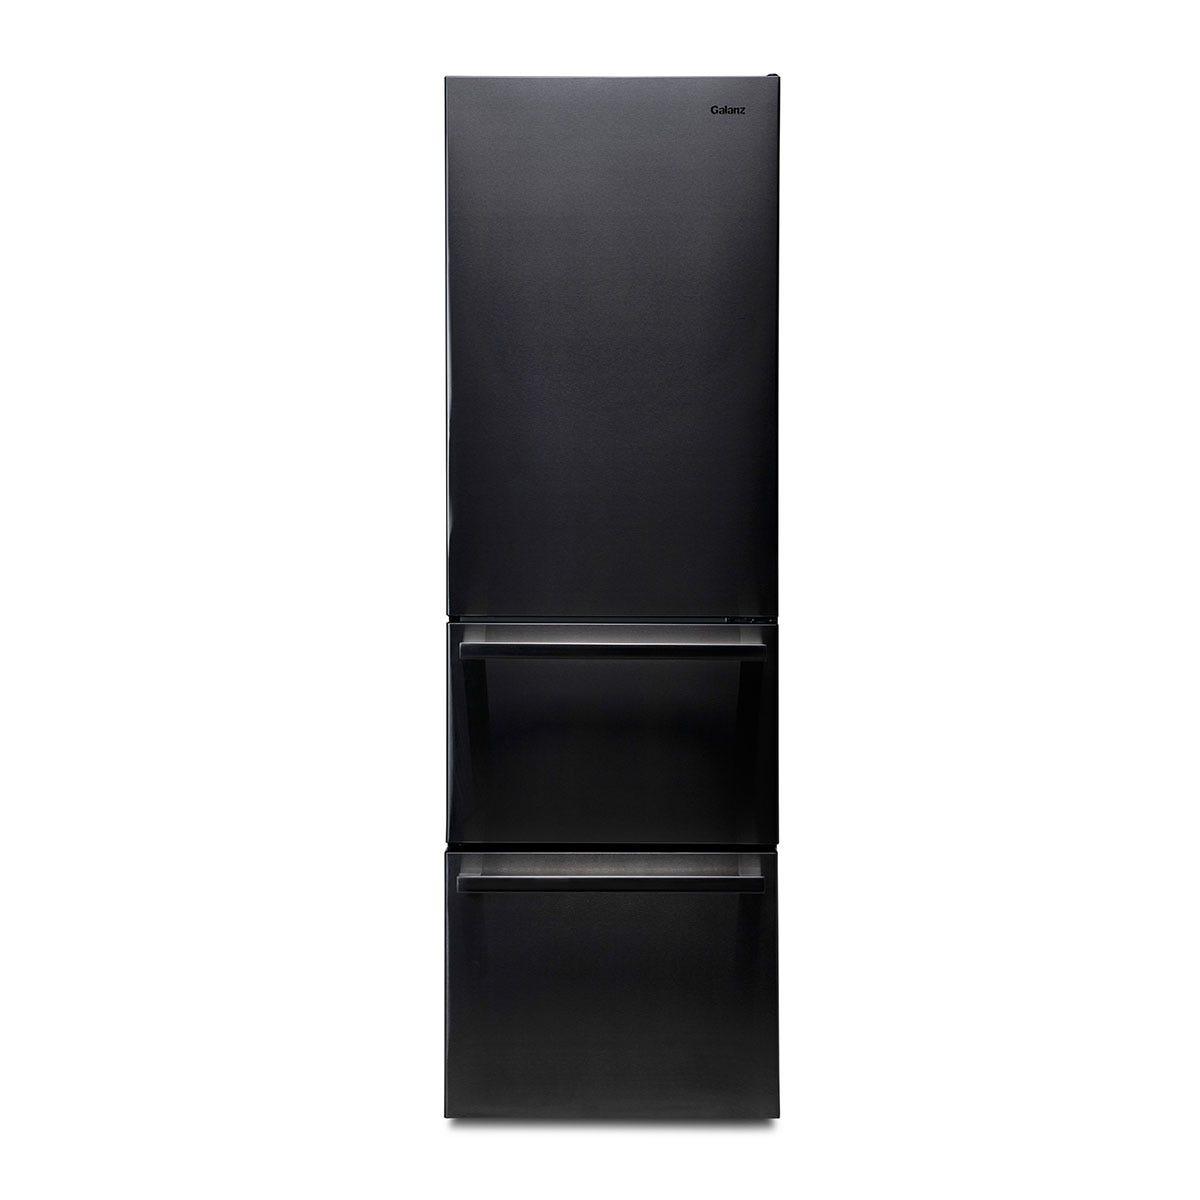 Galanz FFK002SS Freestanding 318L Tri-Door Fridge Freezer - Black Stainless Steel